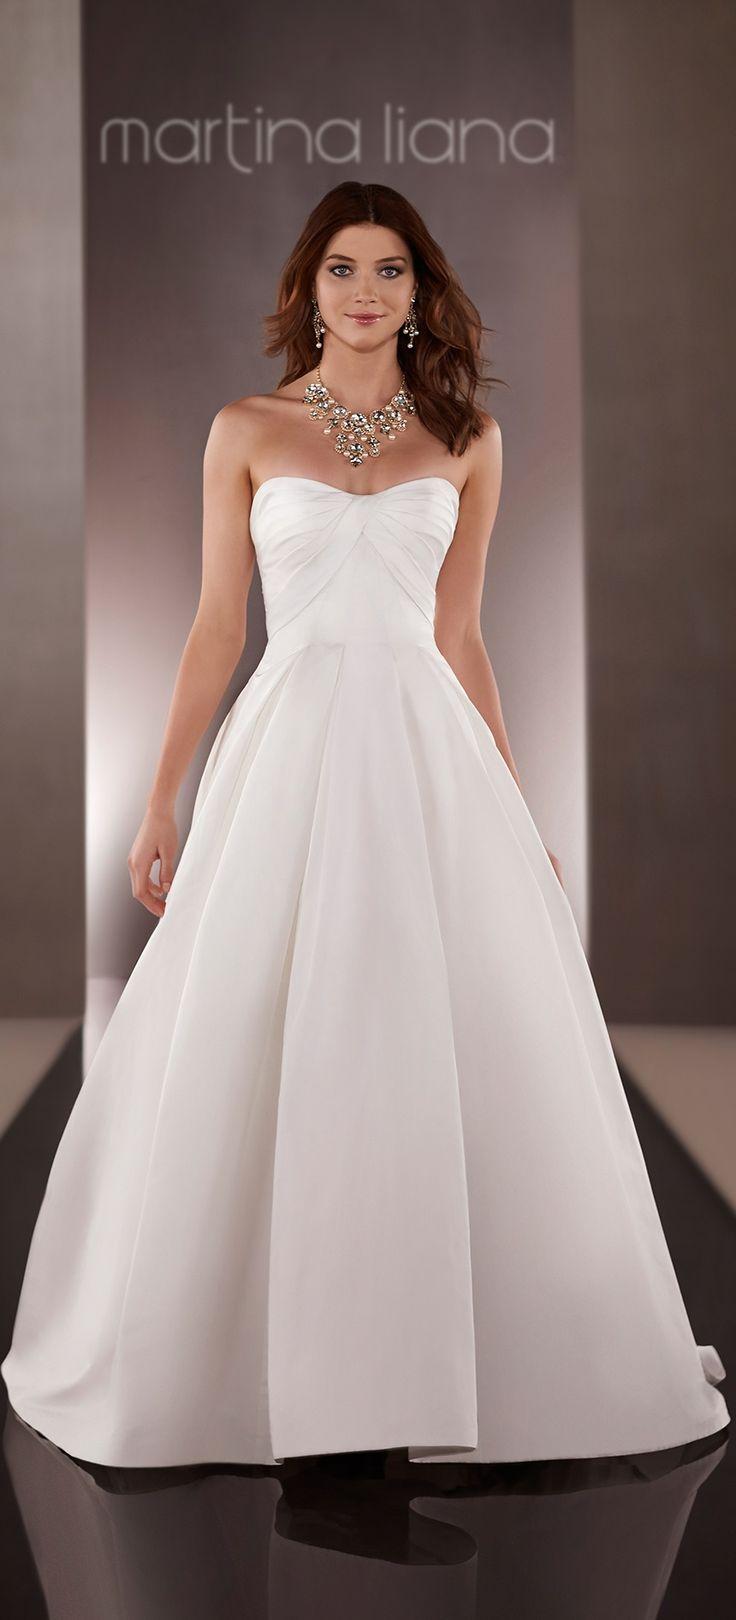 426 best wedding dresses dress up dreams images on pinterest pretty wedding dress by martina liana ombrellifo Gallery